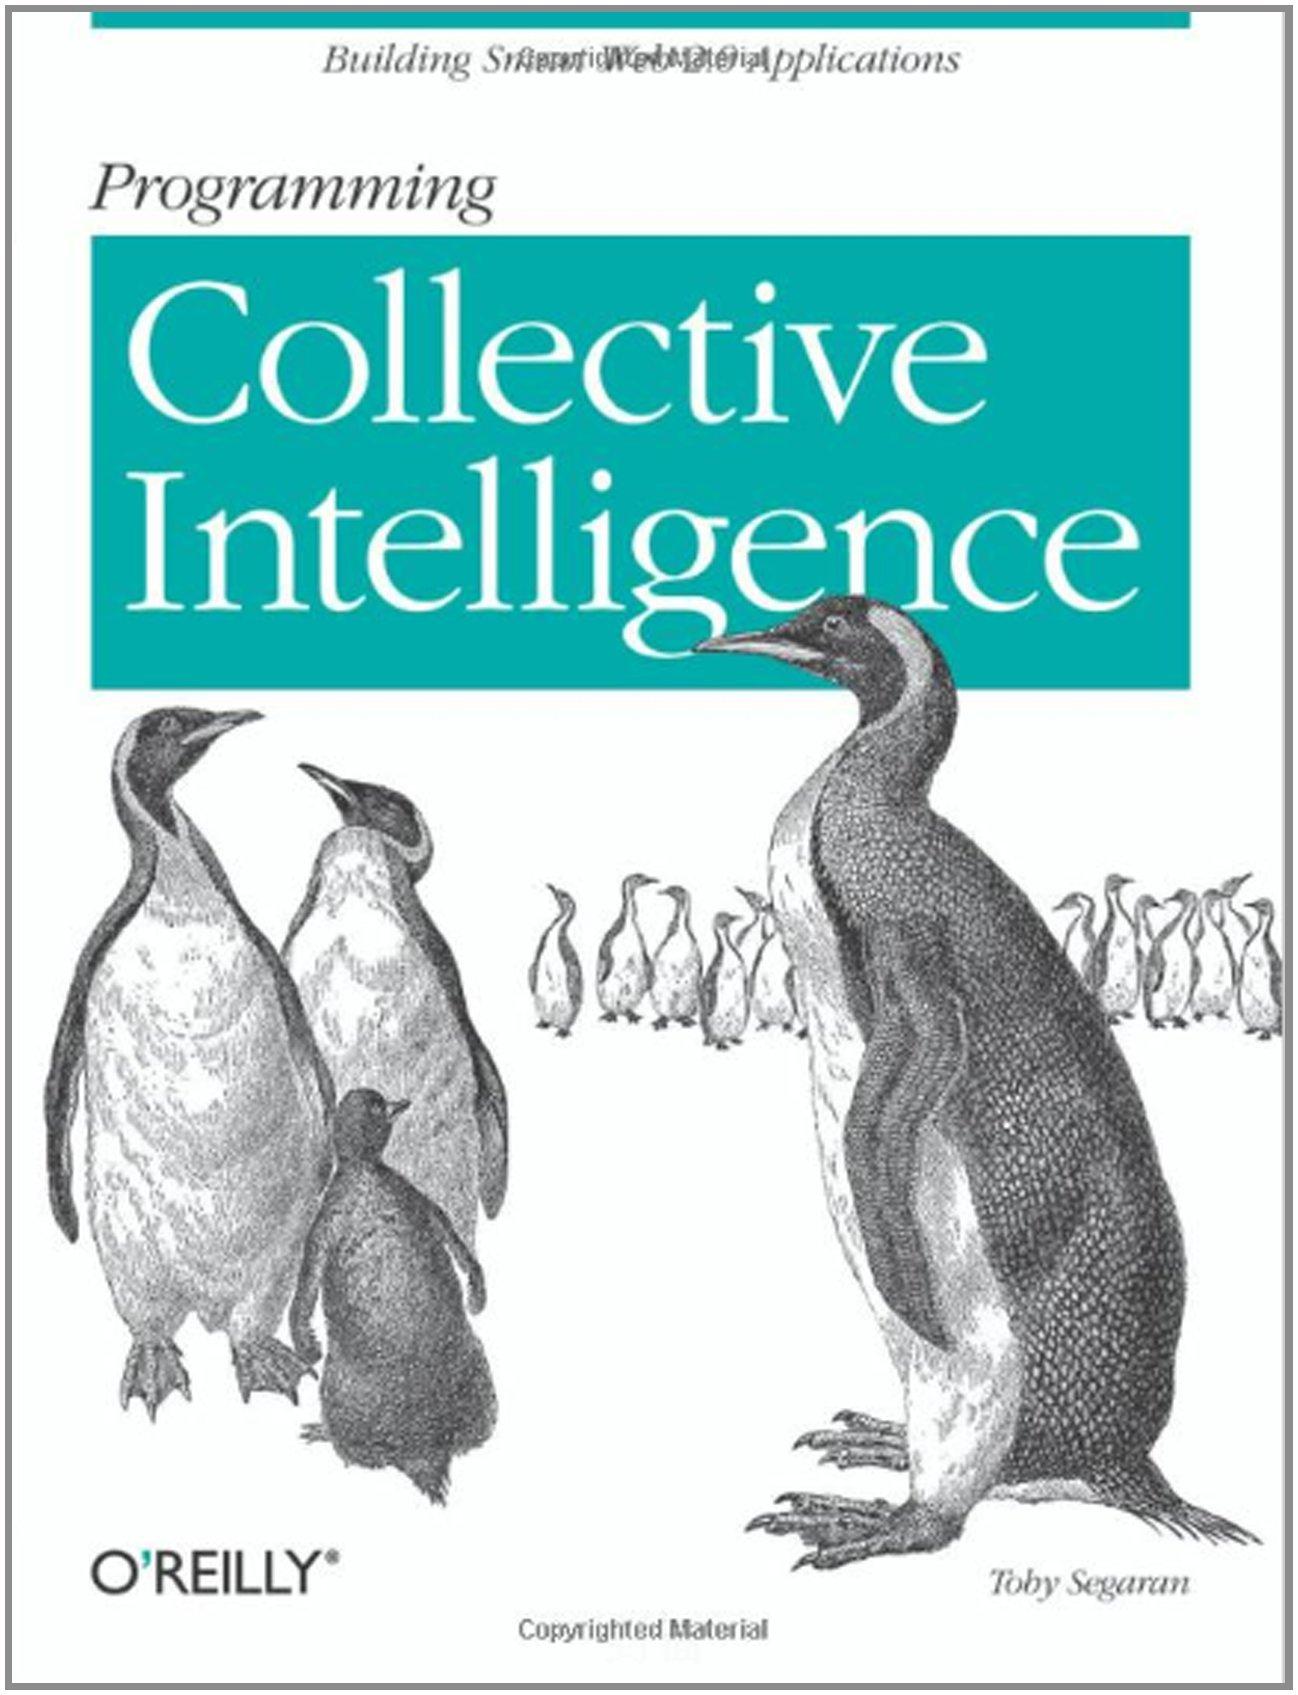 Programming Collective Intelligence - Toby Segaran